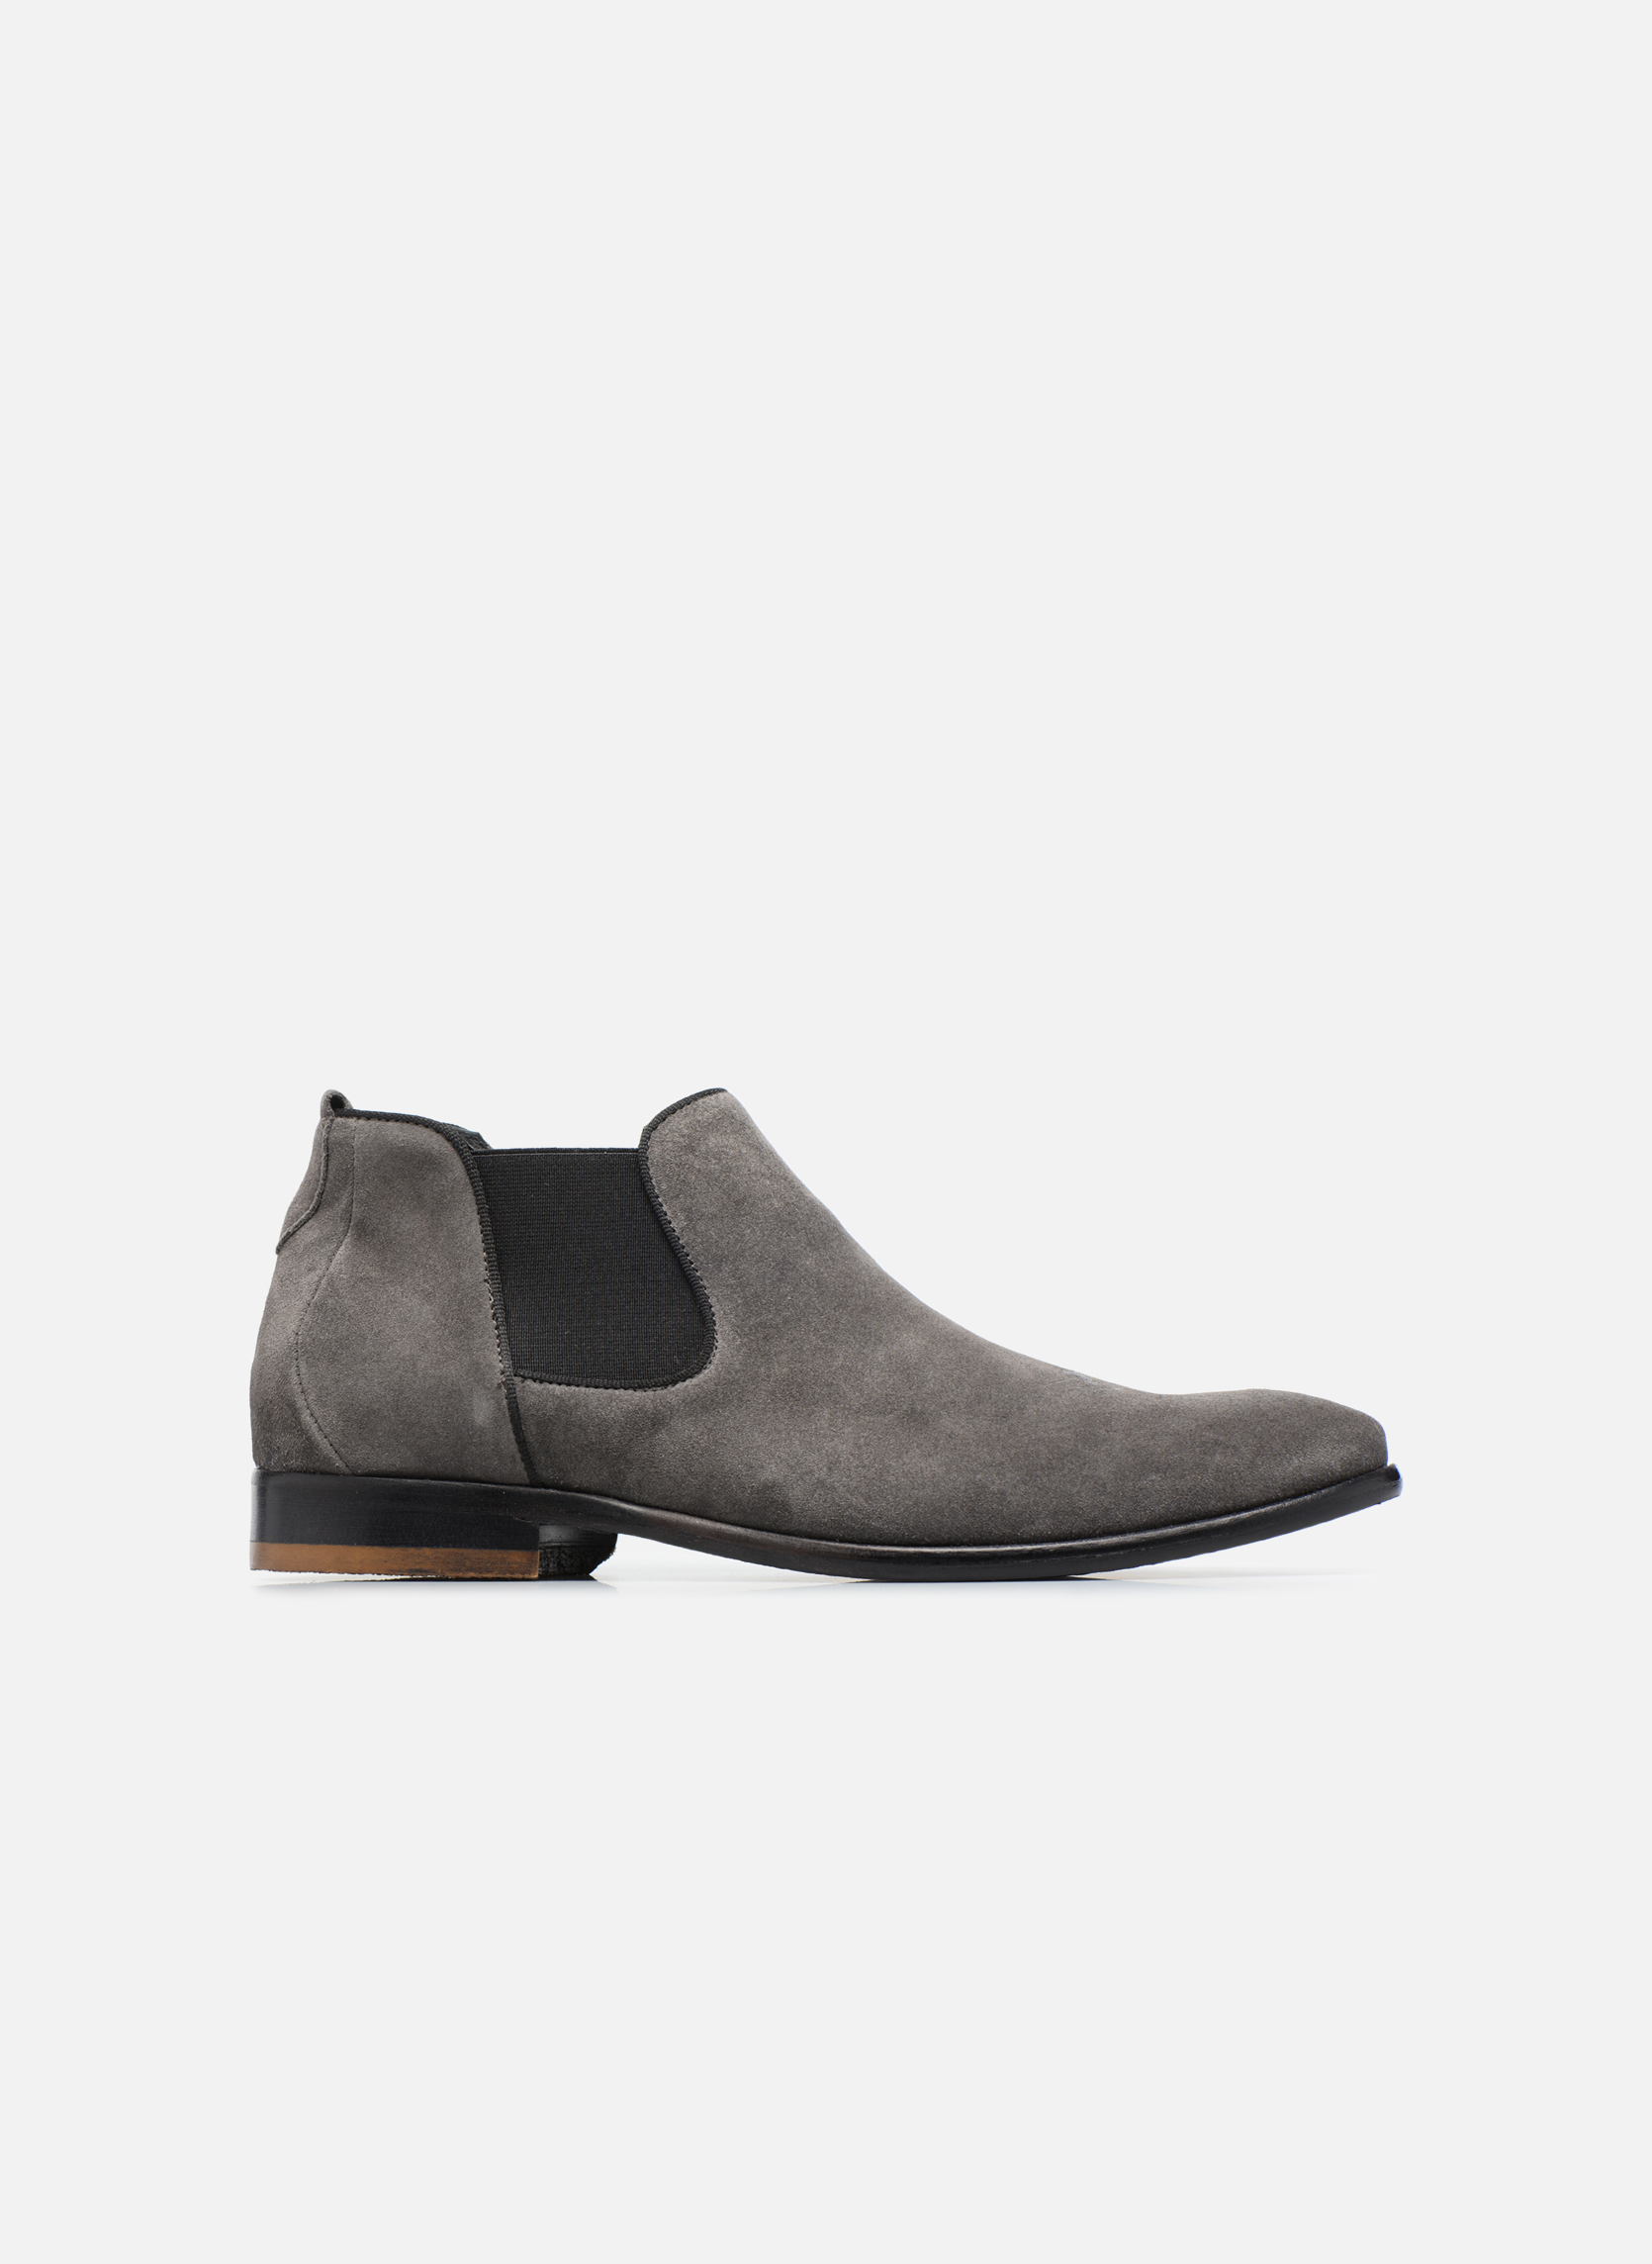 Boots Herr Toddown